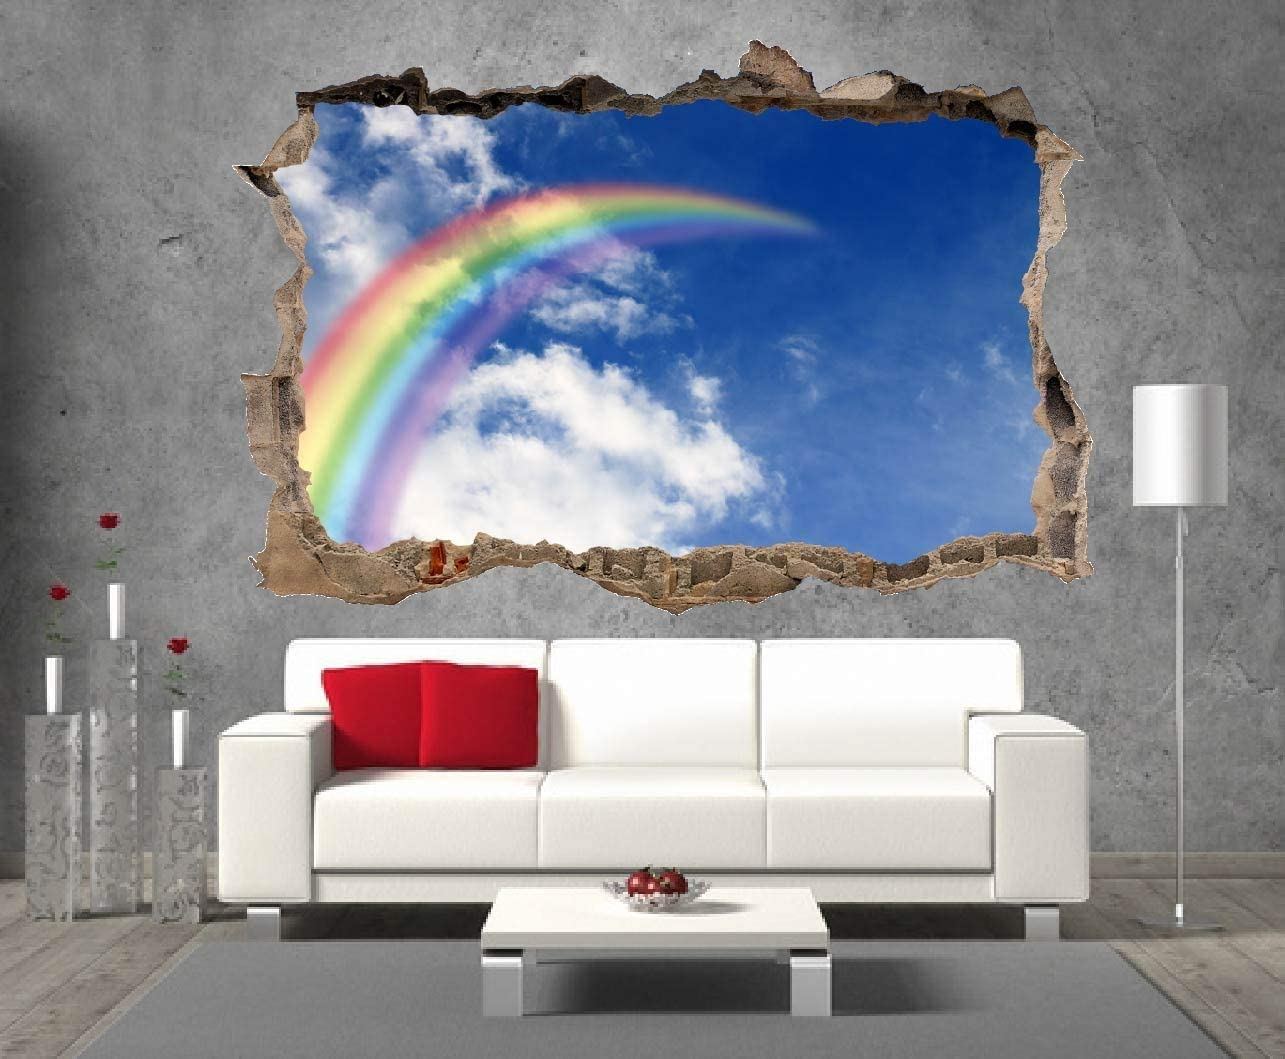 Ranbow autocollant mural 3D look-garçons filles enfants licorne papillon wall decal Z411